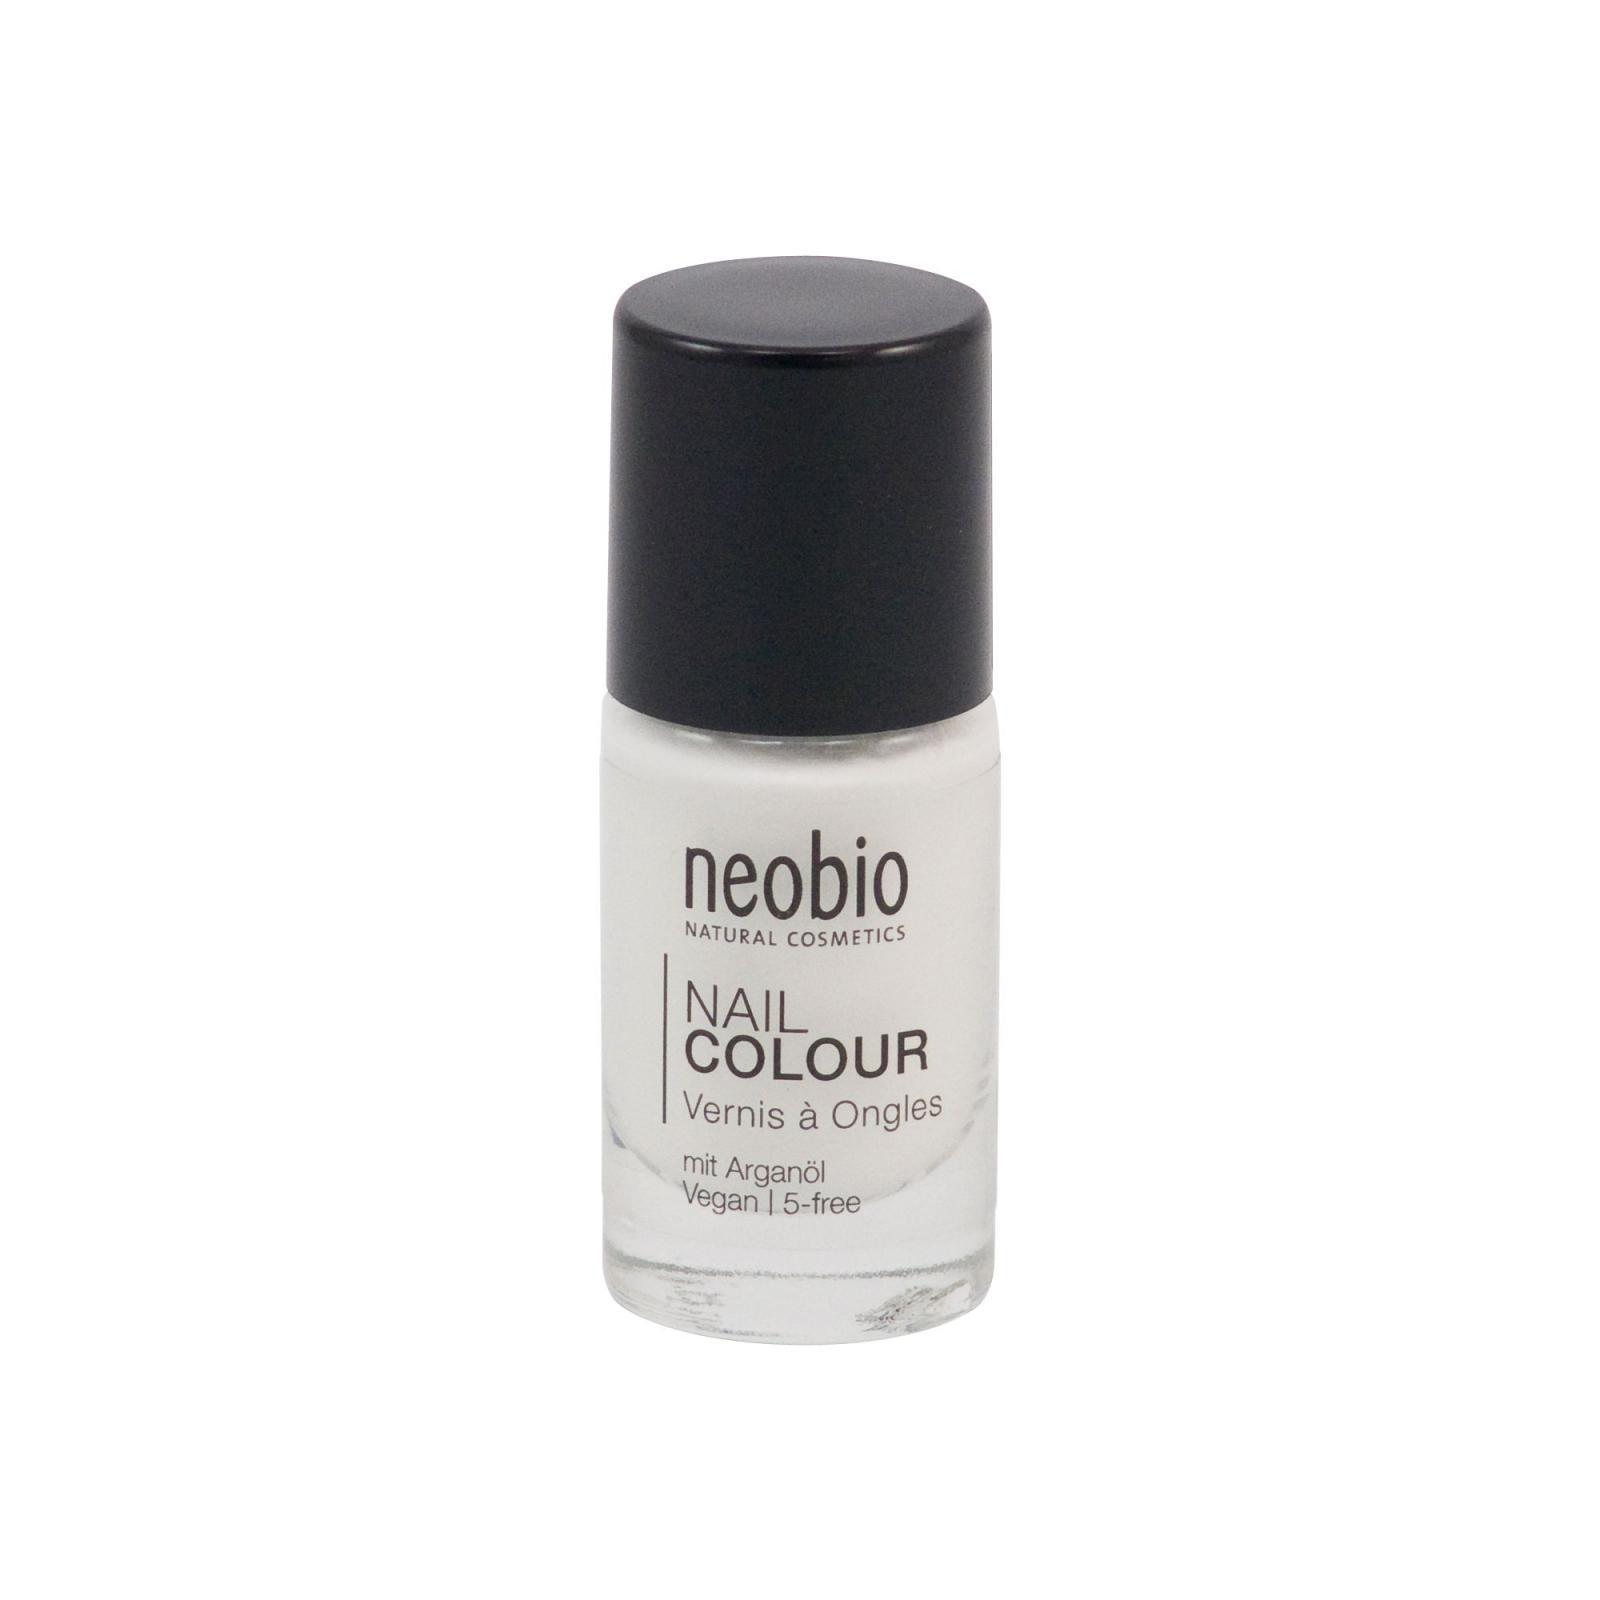 Biooo Cz Neobio Lak Na Nehty 07 French Nail 8 Ml